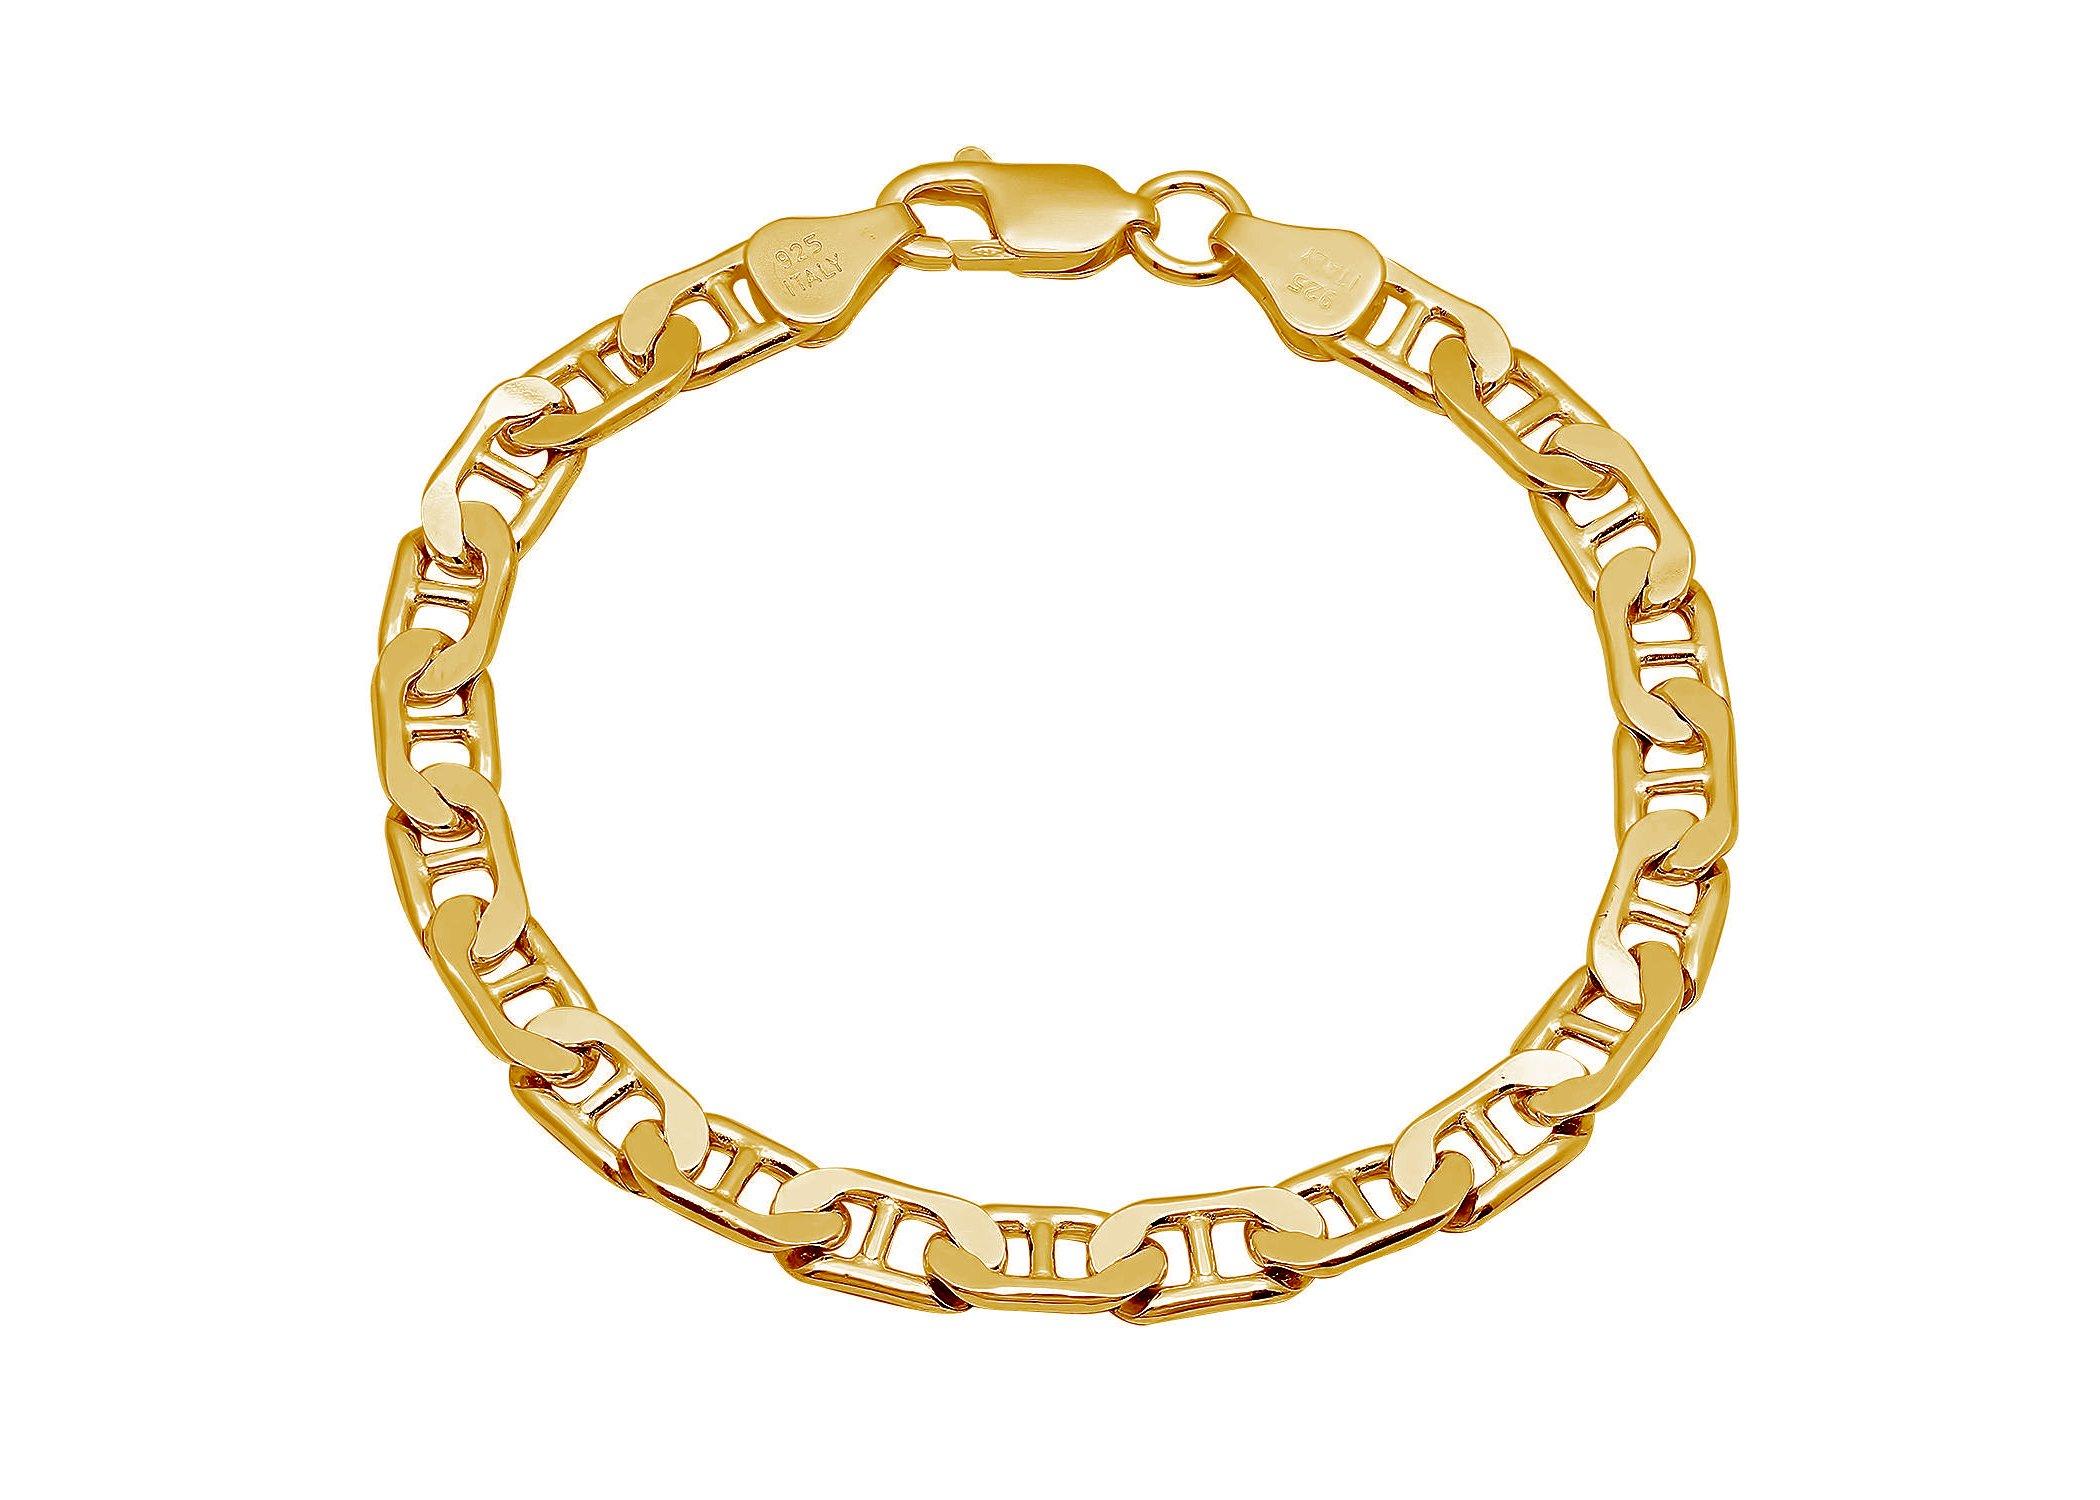 "925 Italian Sterling Silver Gold Mariner Link Chain 4.5mm Bracelet - Fine Jewelry For Men Women (8"") by Pori Jewelers (Image #1)"